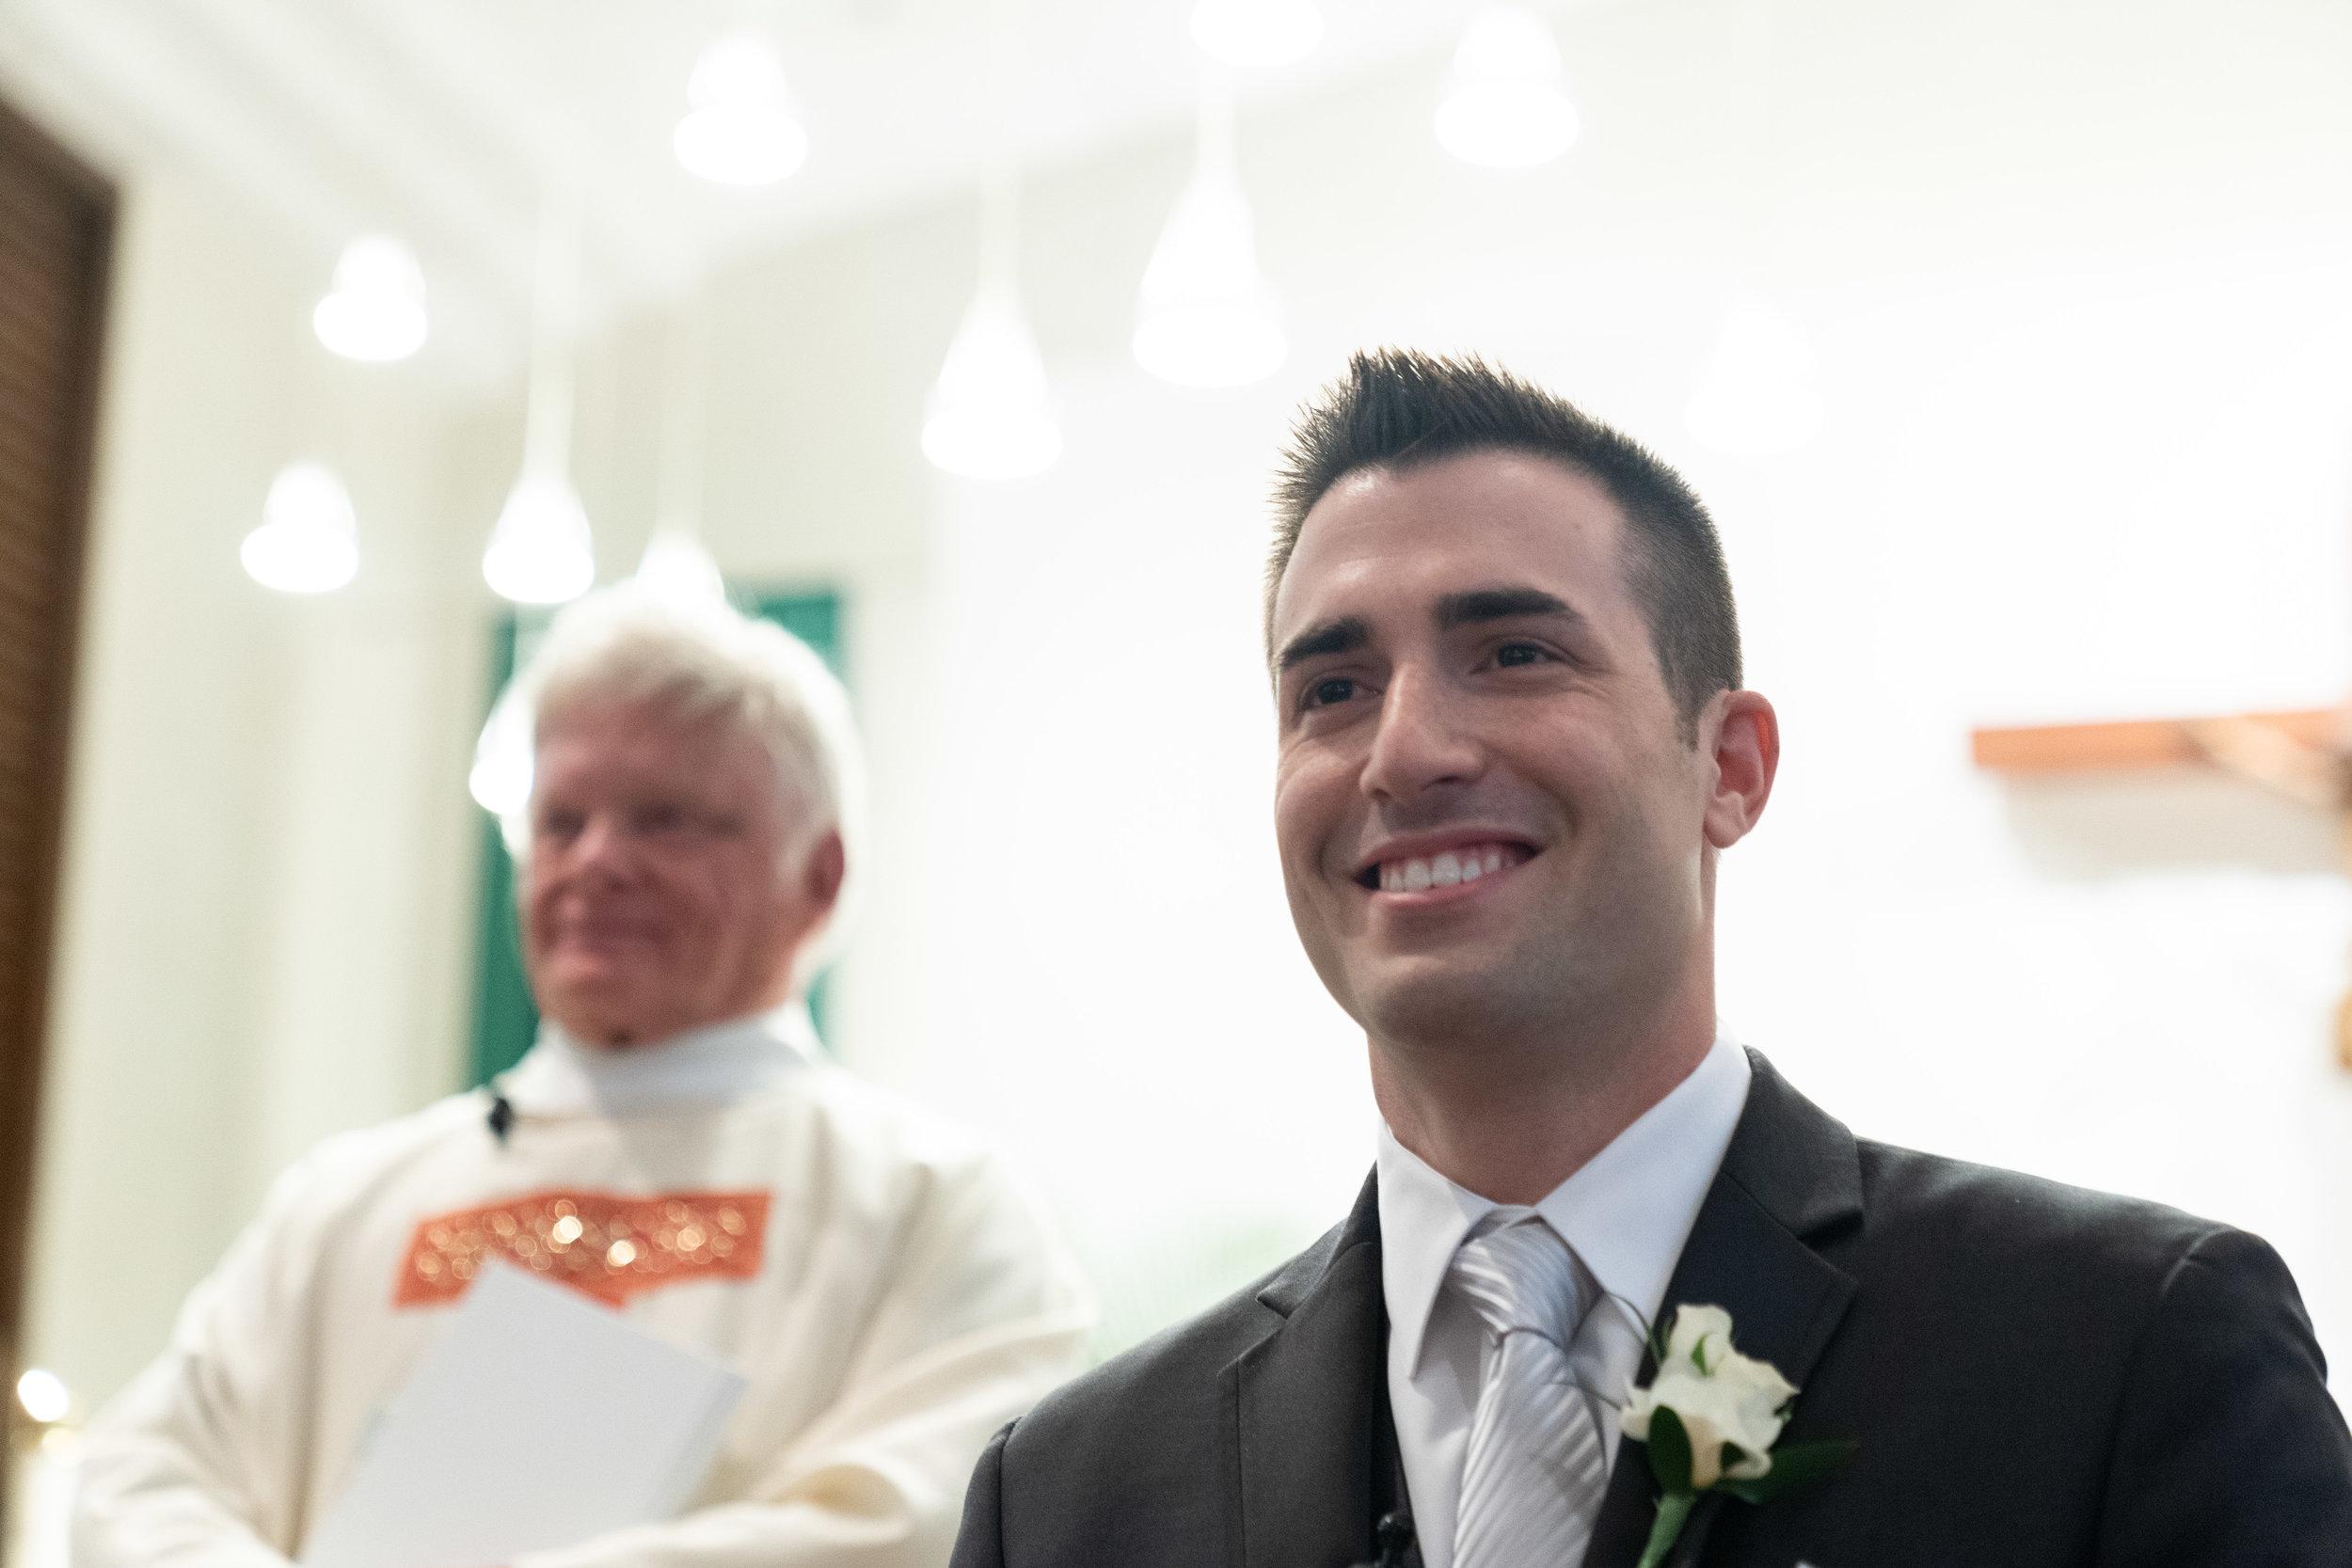 Wedding-couple-takes-photos-at-lowes-hardware-due-to-rain34.jpg